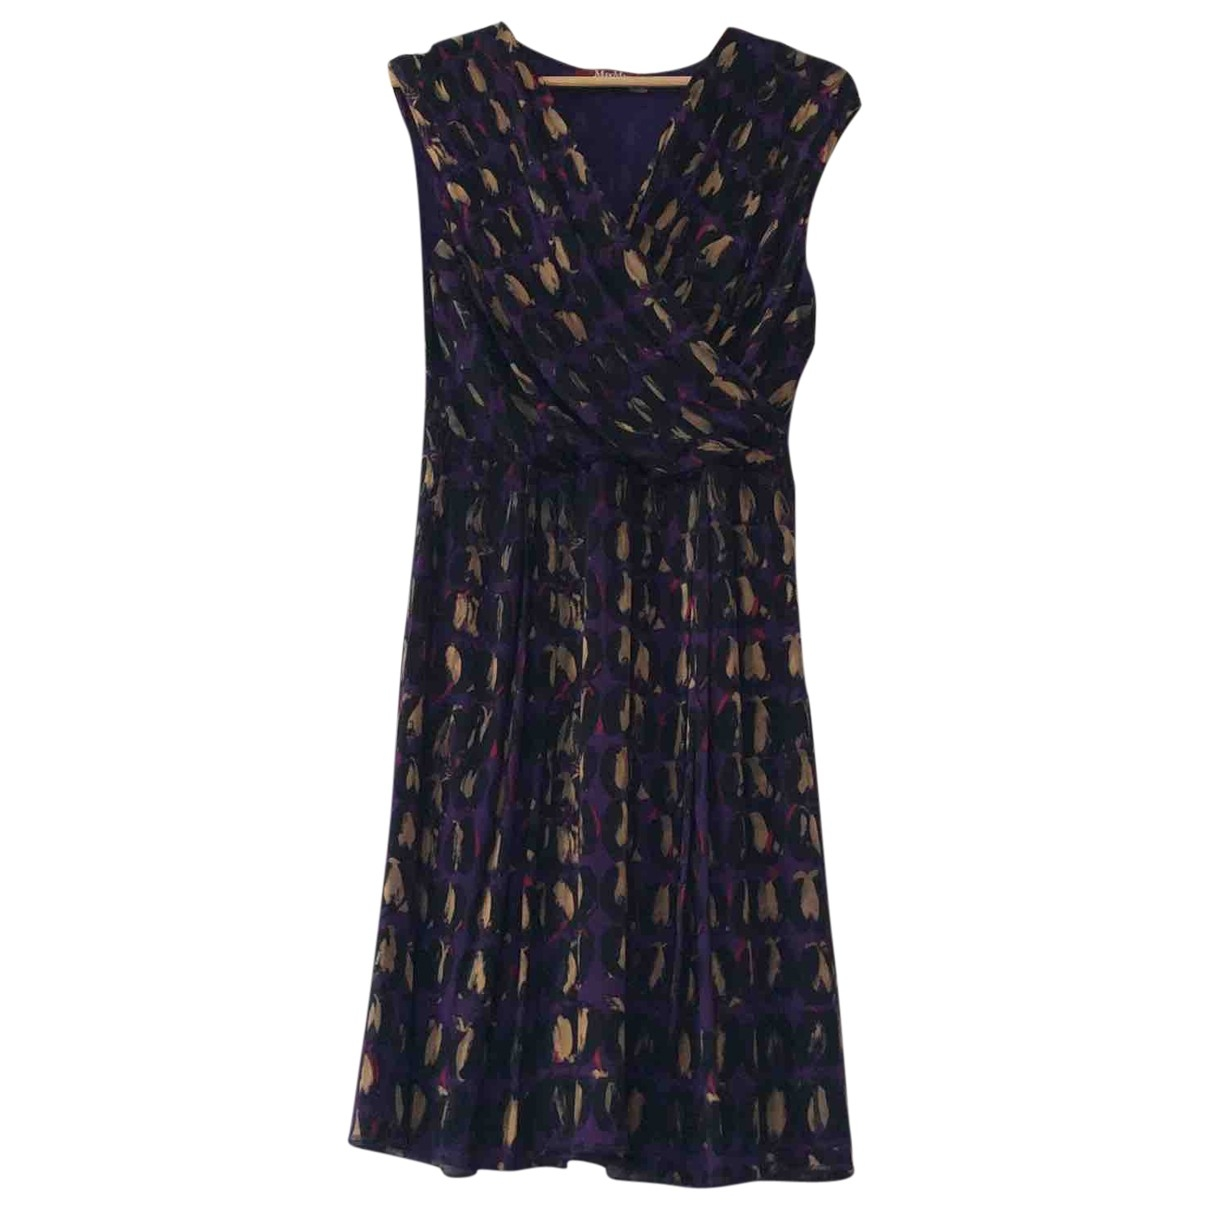 Max Mara Studio \N Multicolour Silk dress for Women L International